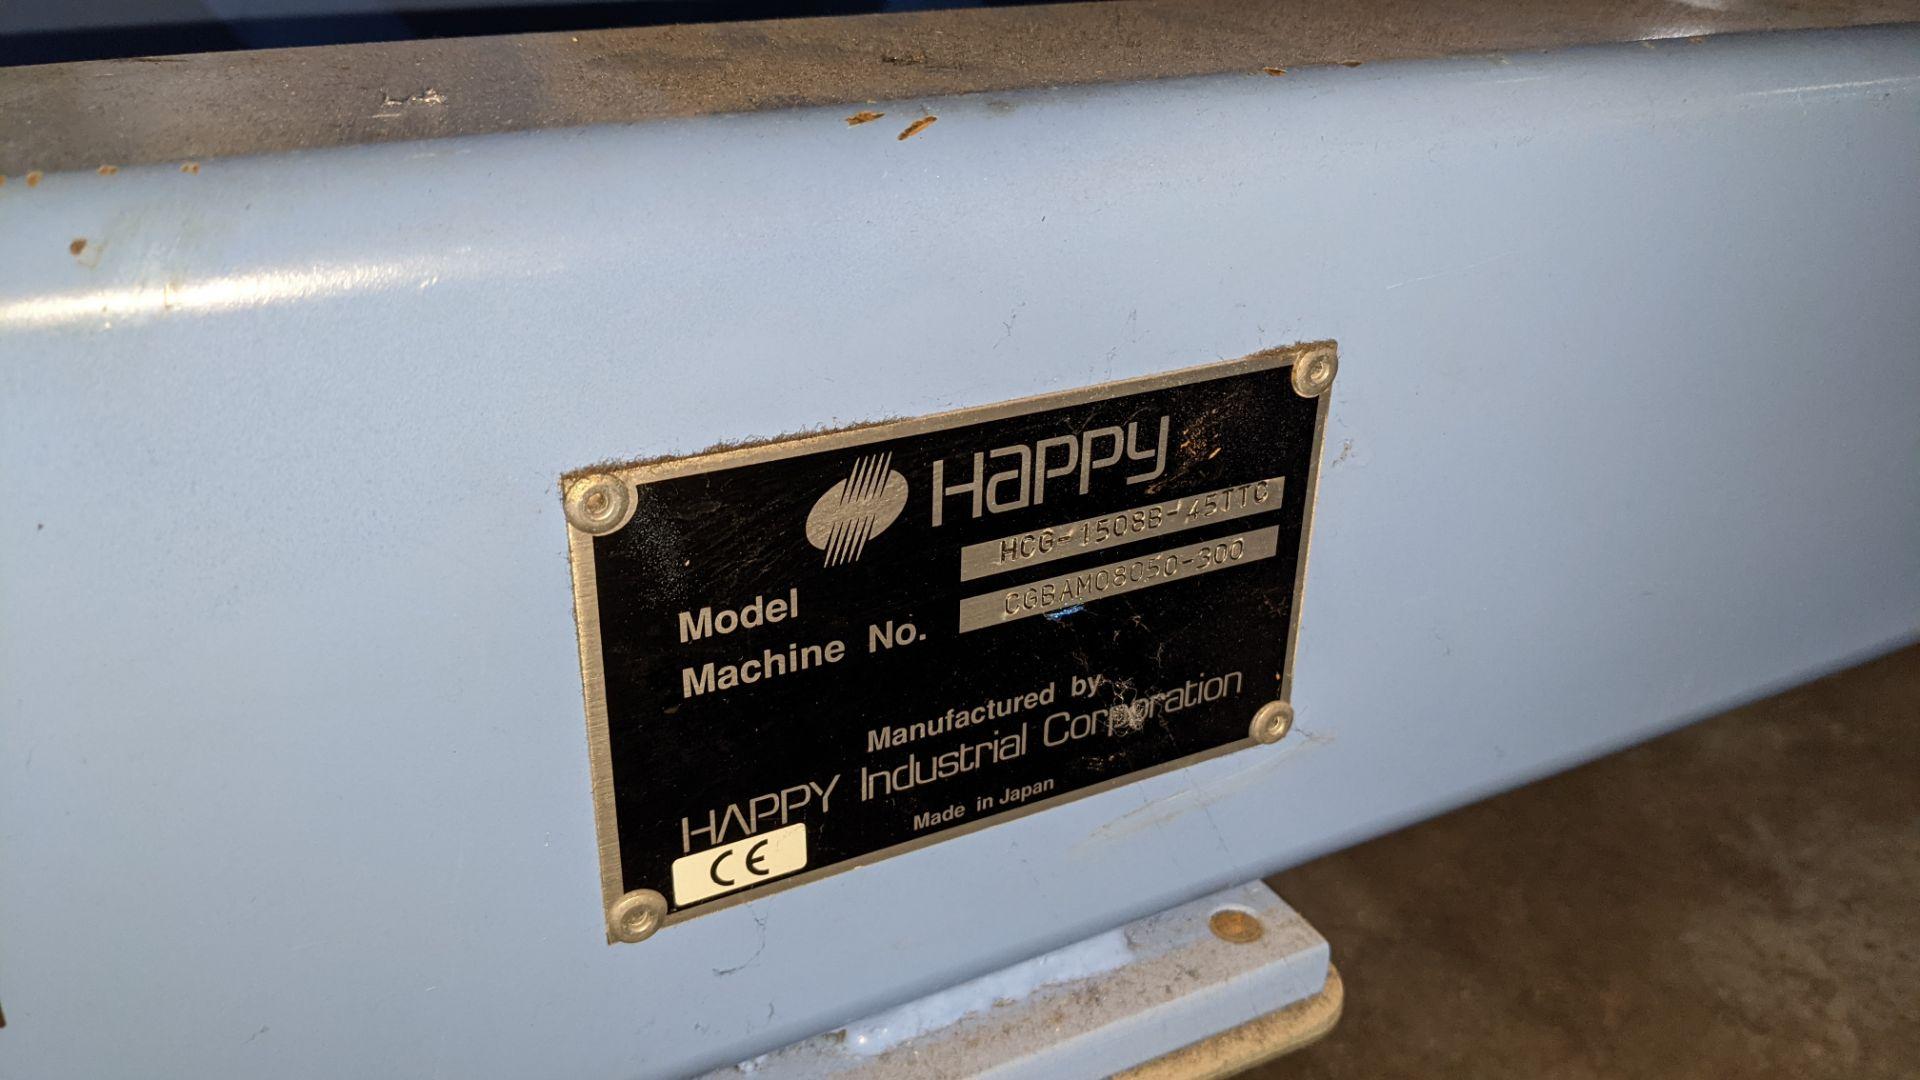 Happy 8 head embroidery machine, model HCG-1508B-45TTC, 15 needles per head, including frames & othe - Image 22 of 32